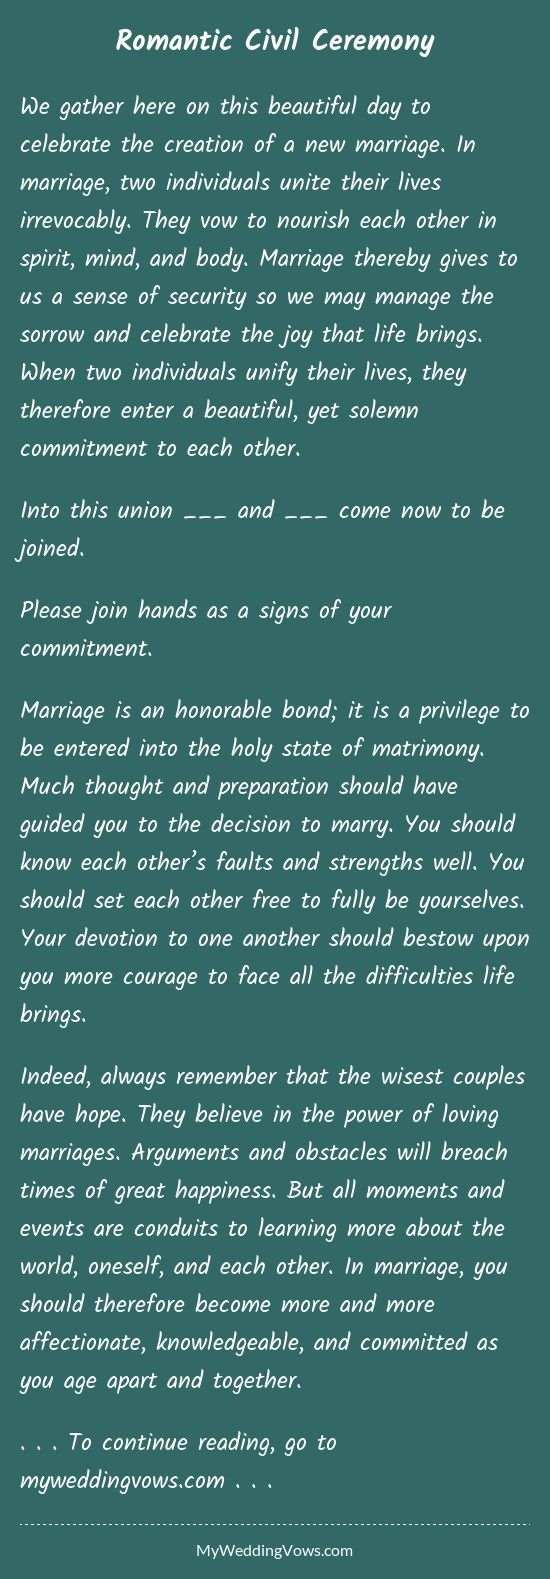 Romantic Civil Ceremony Wedding officiant script